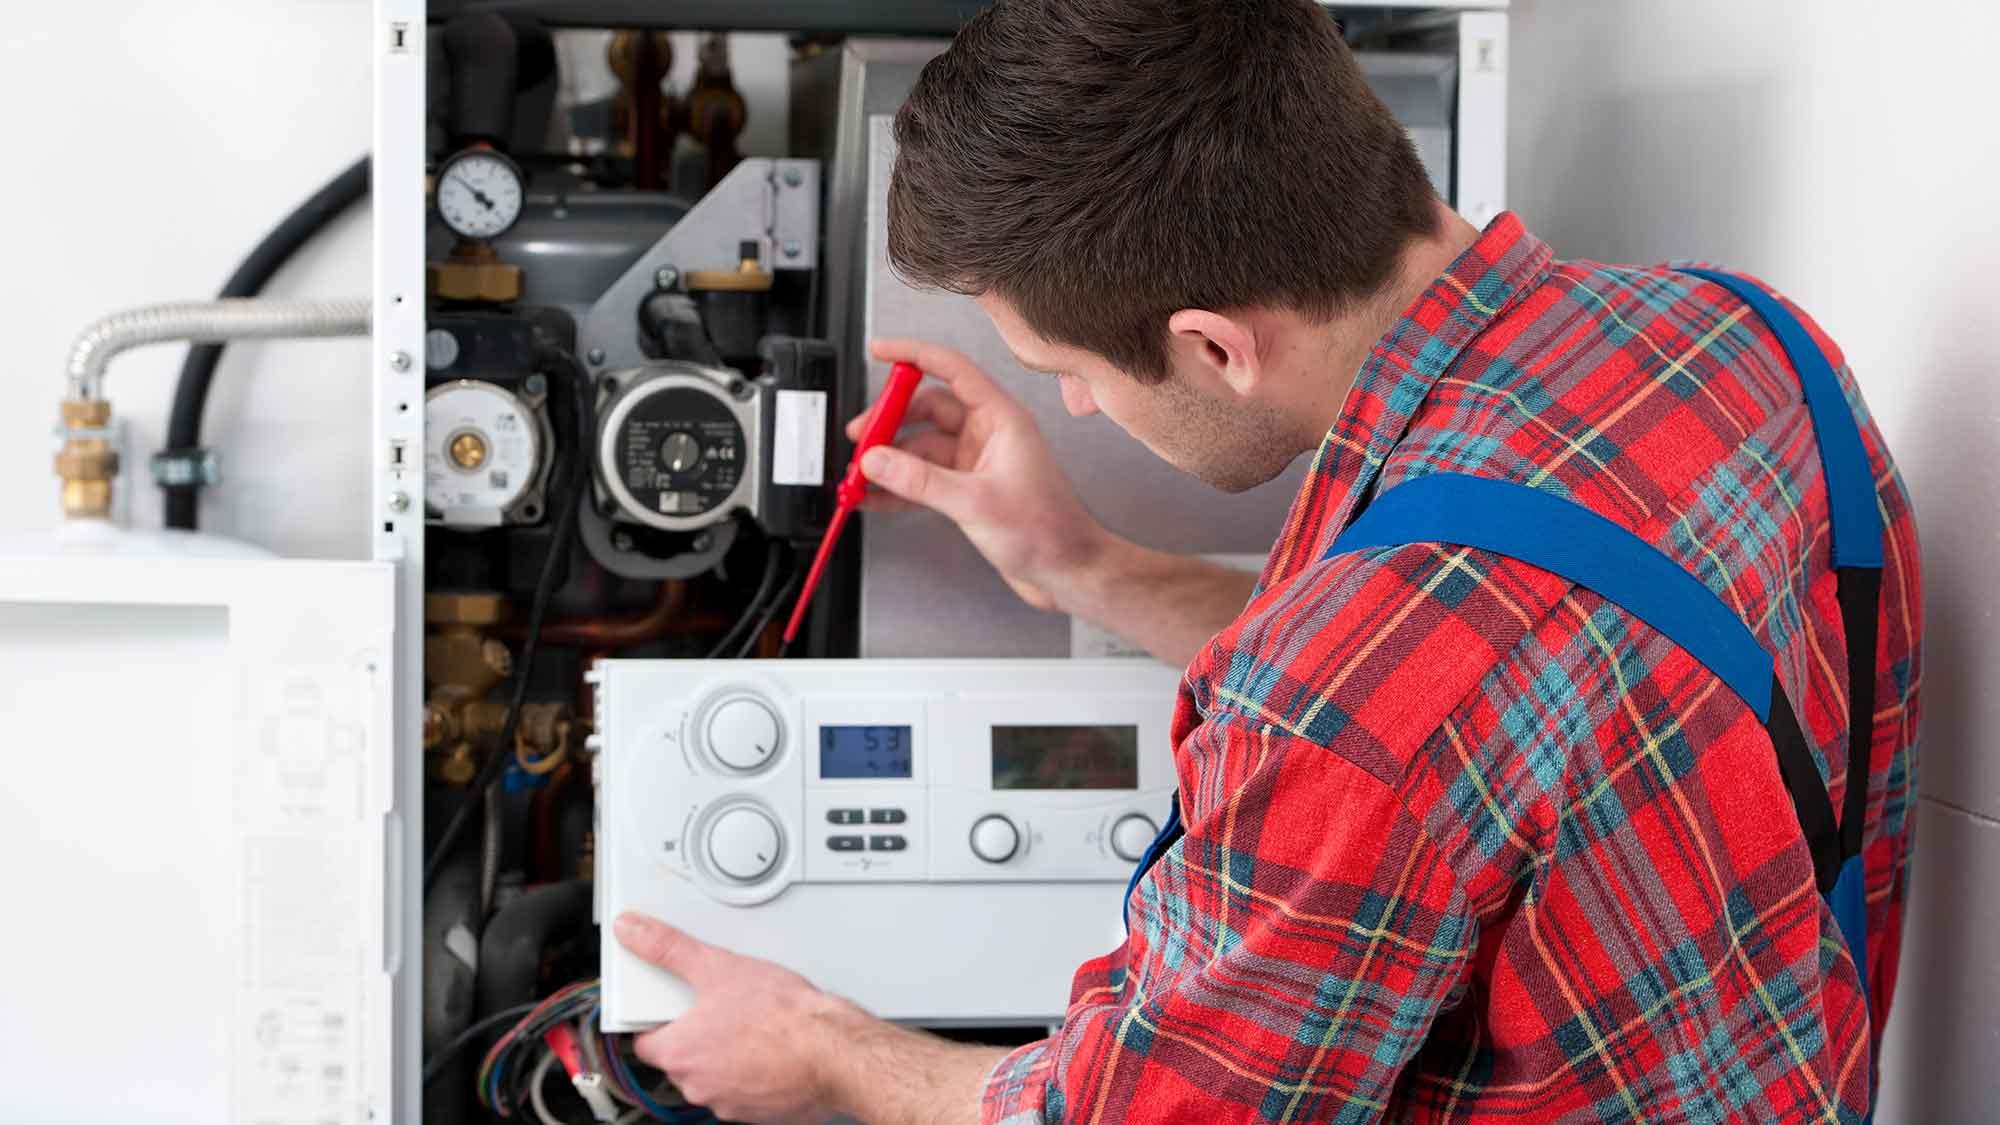 boiler repair essex maintenance leigh on sea fix